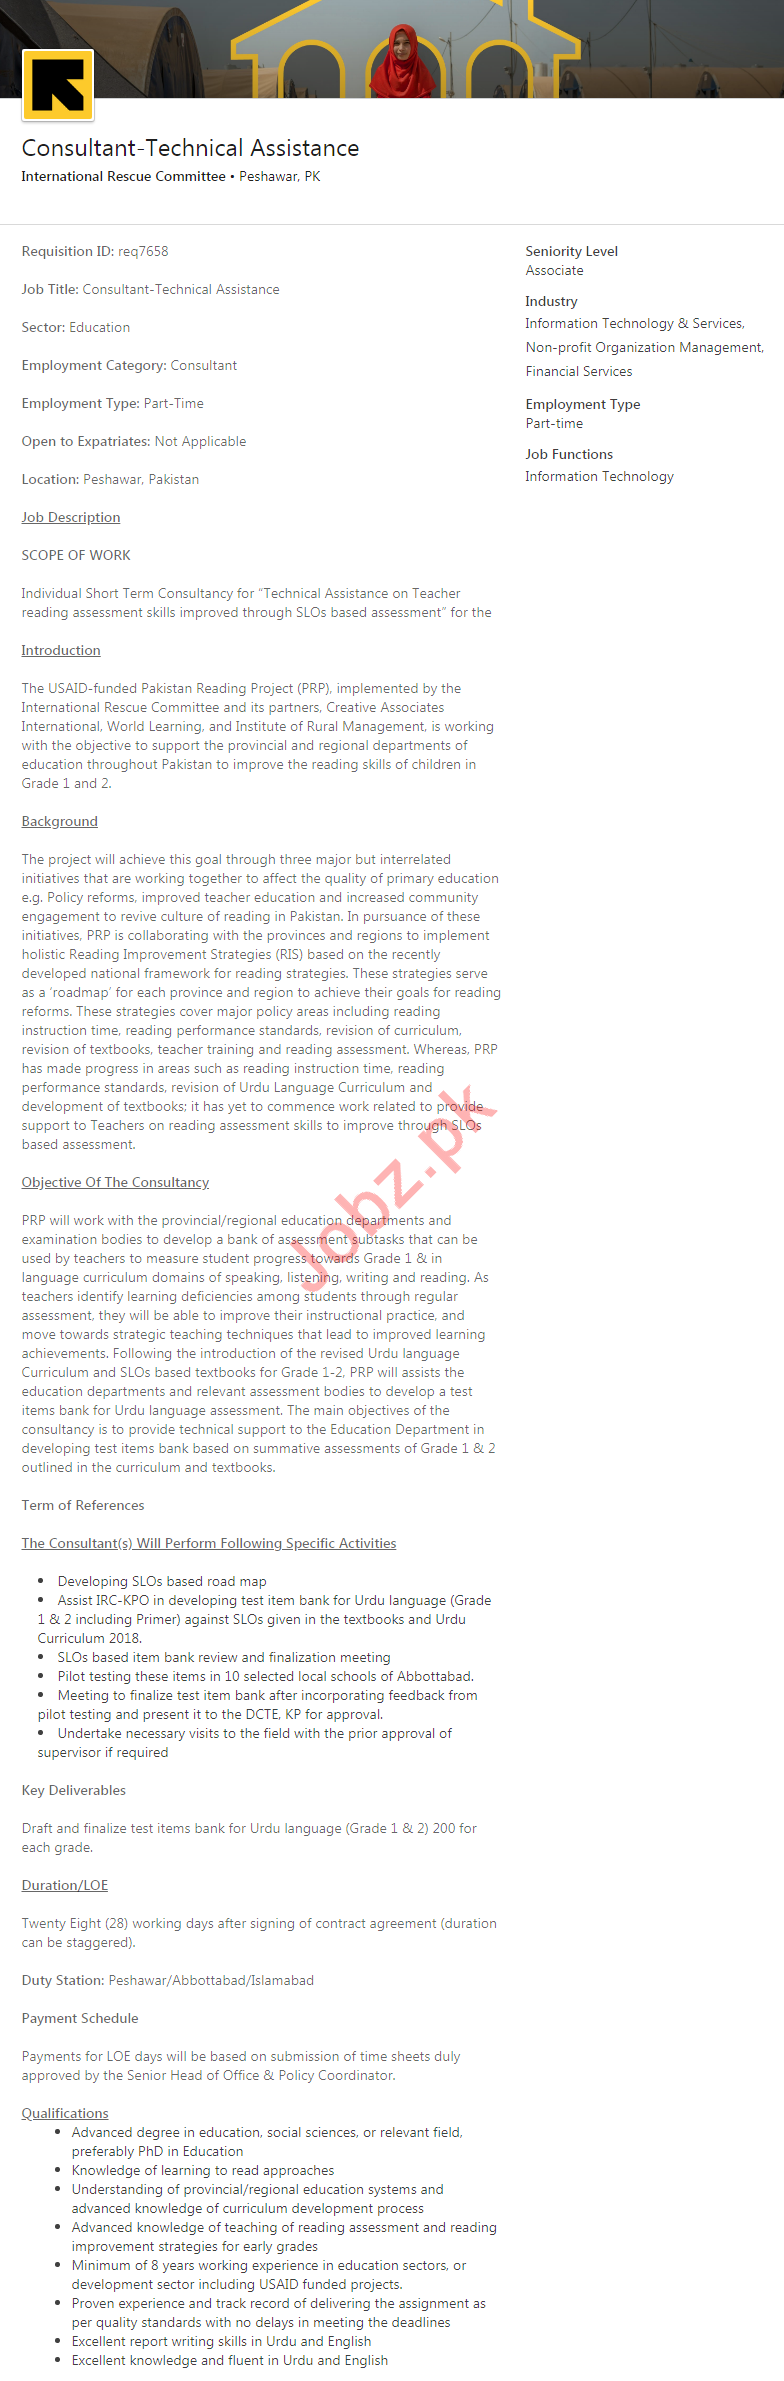 IRC International Rescue Committee Peshawar NGO Jobs 2020